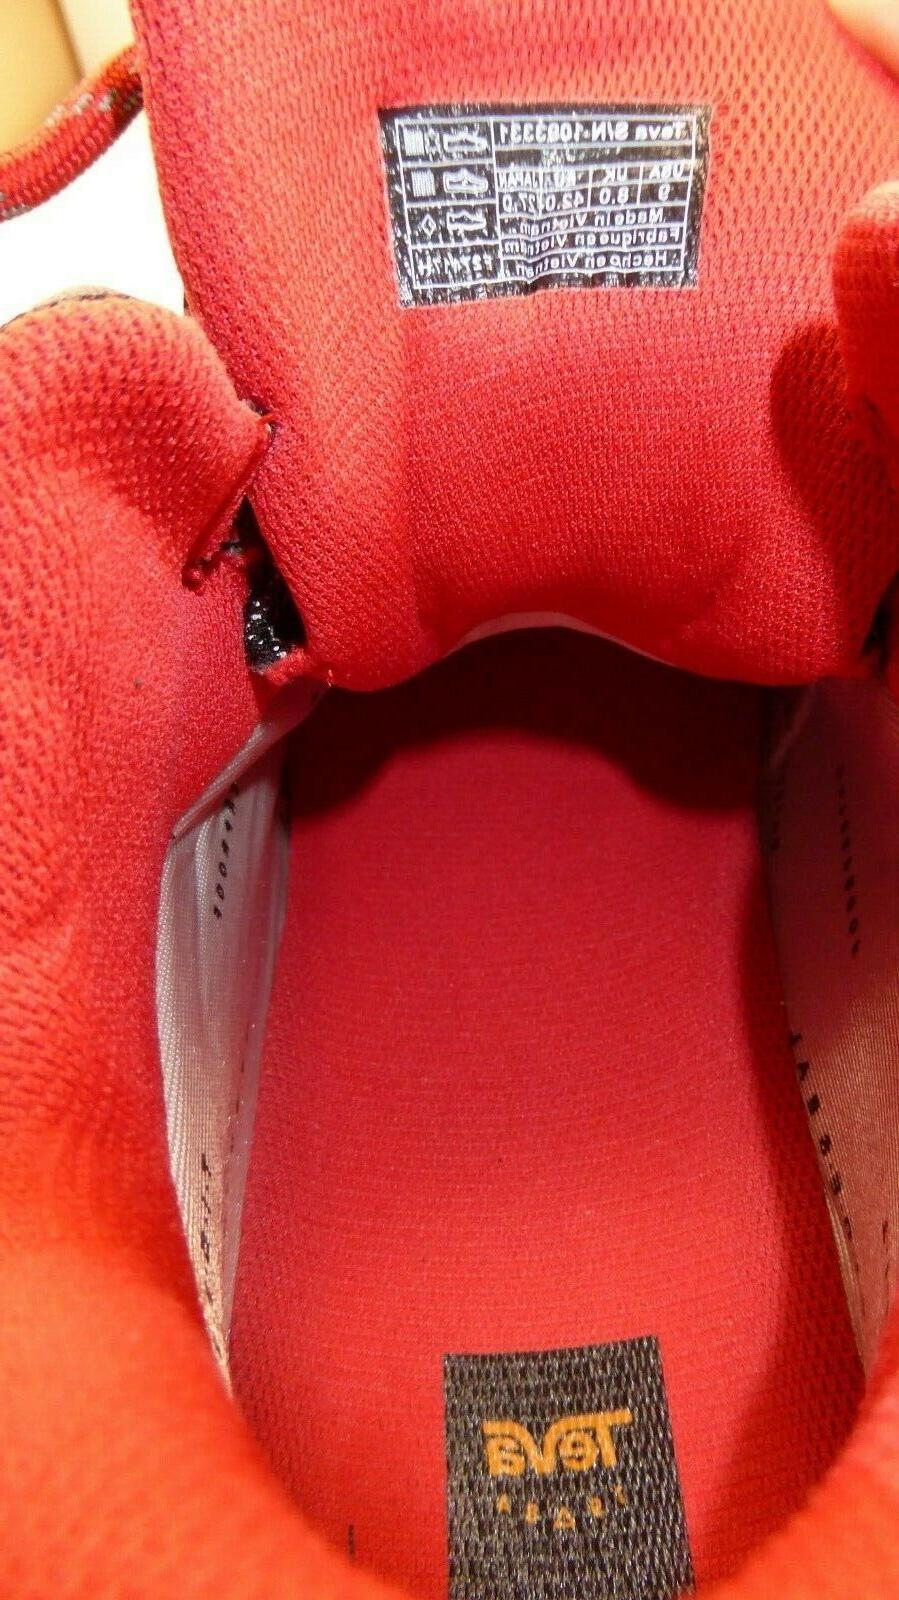 NEW Teva Men's 9 Waterproof Flash $150 Hiking Boots Gray